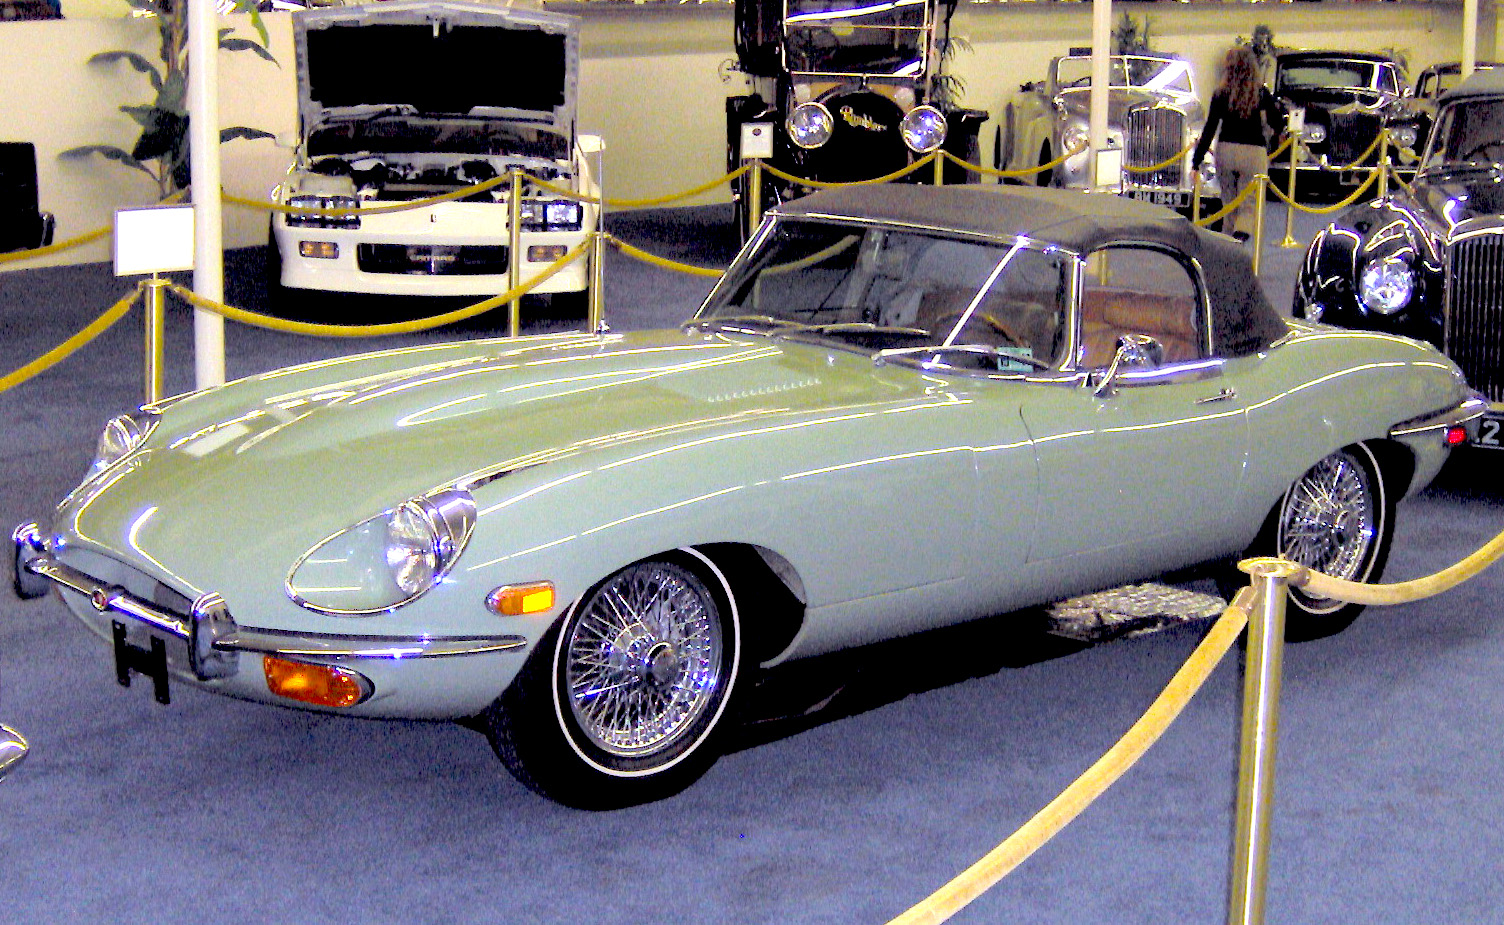 File:1970 Jaguar E-Type Roadster.JPG - Wikimedia Commons